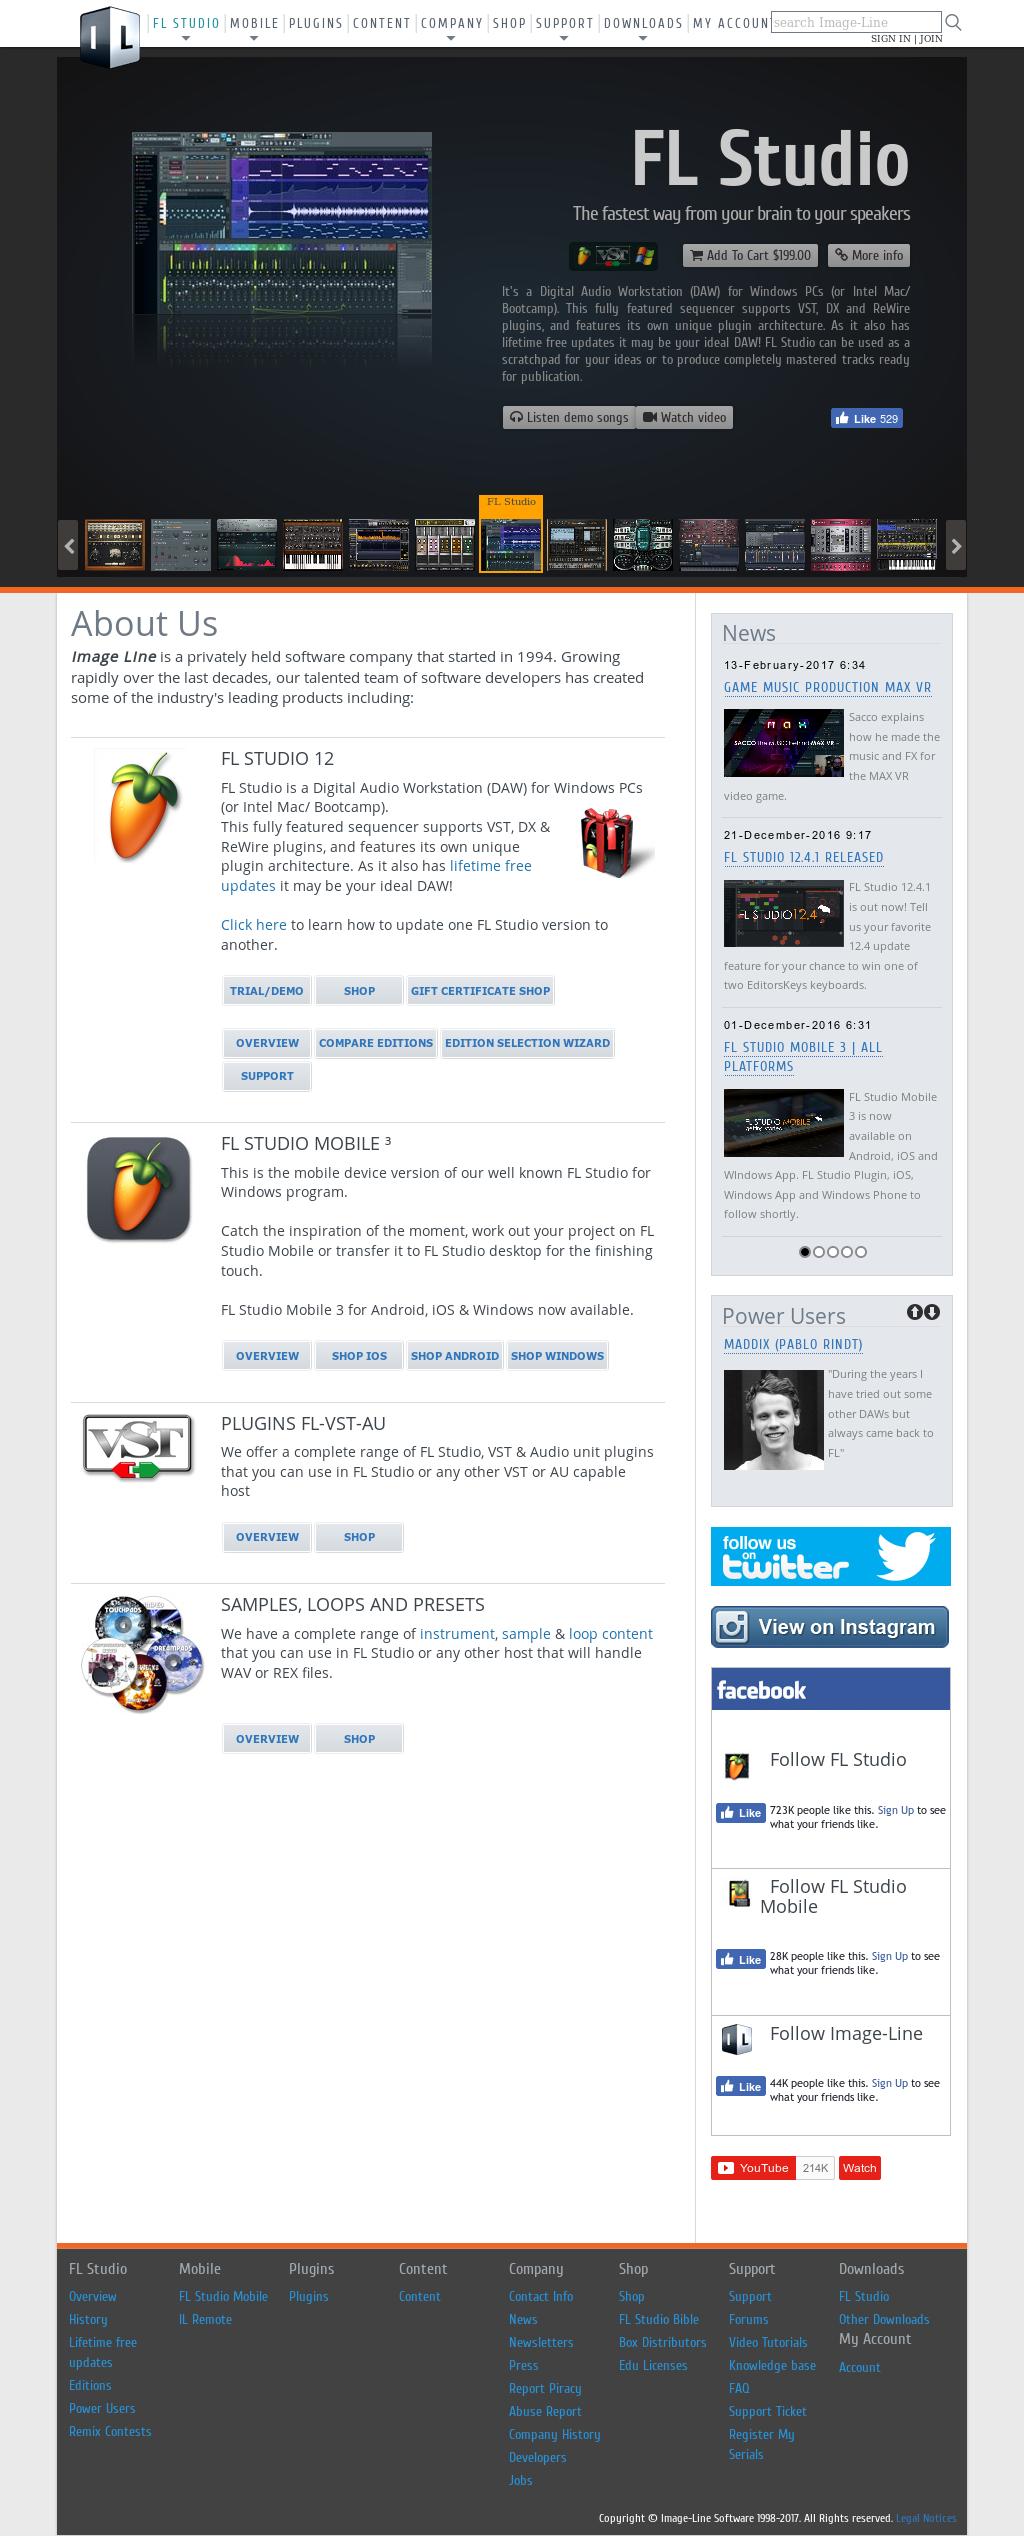 fl studio mobile plugin mac